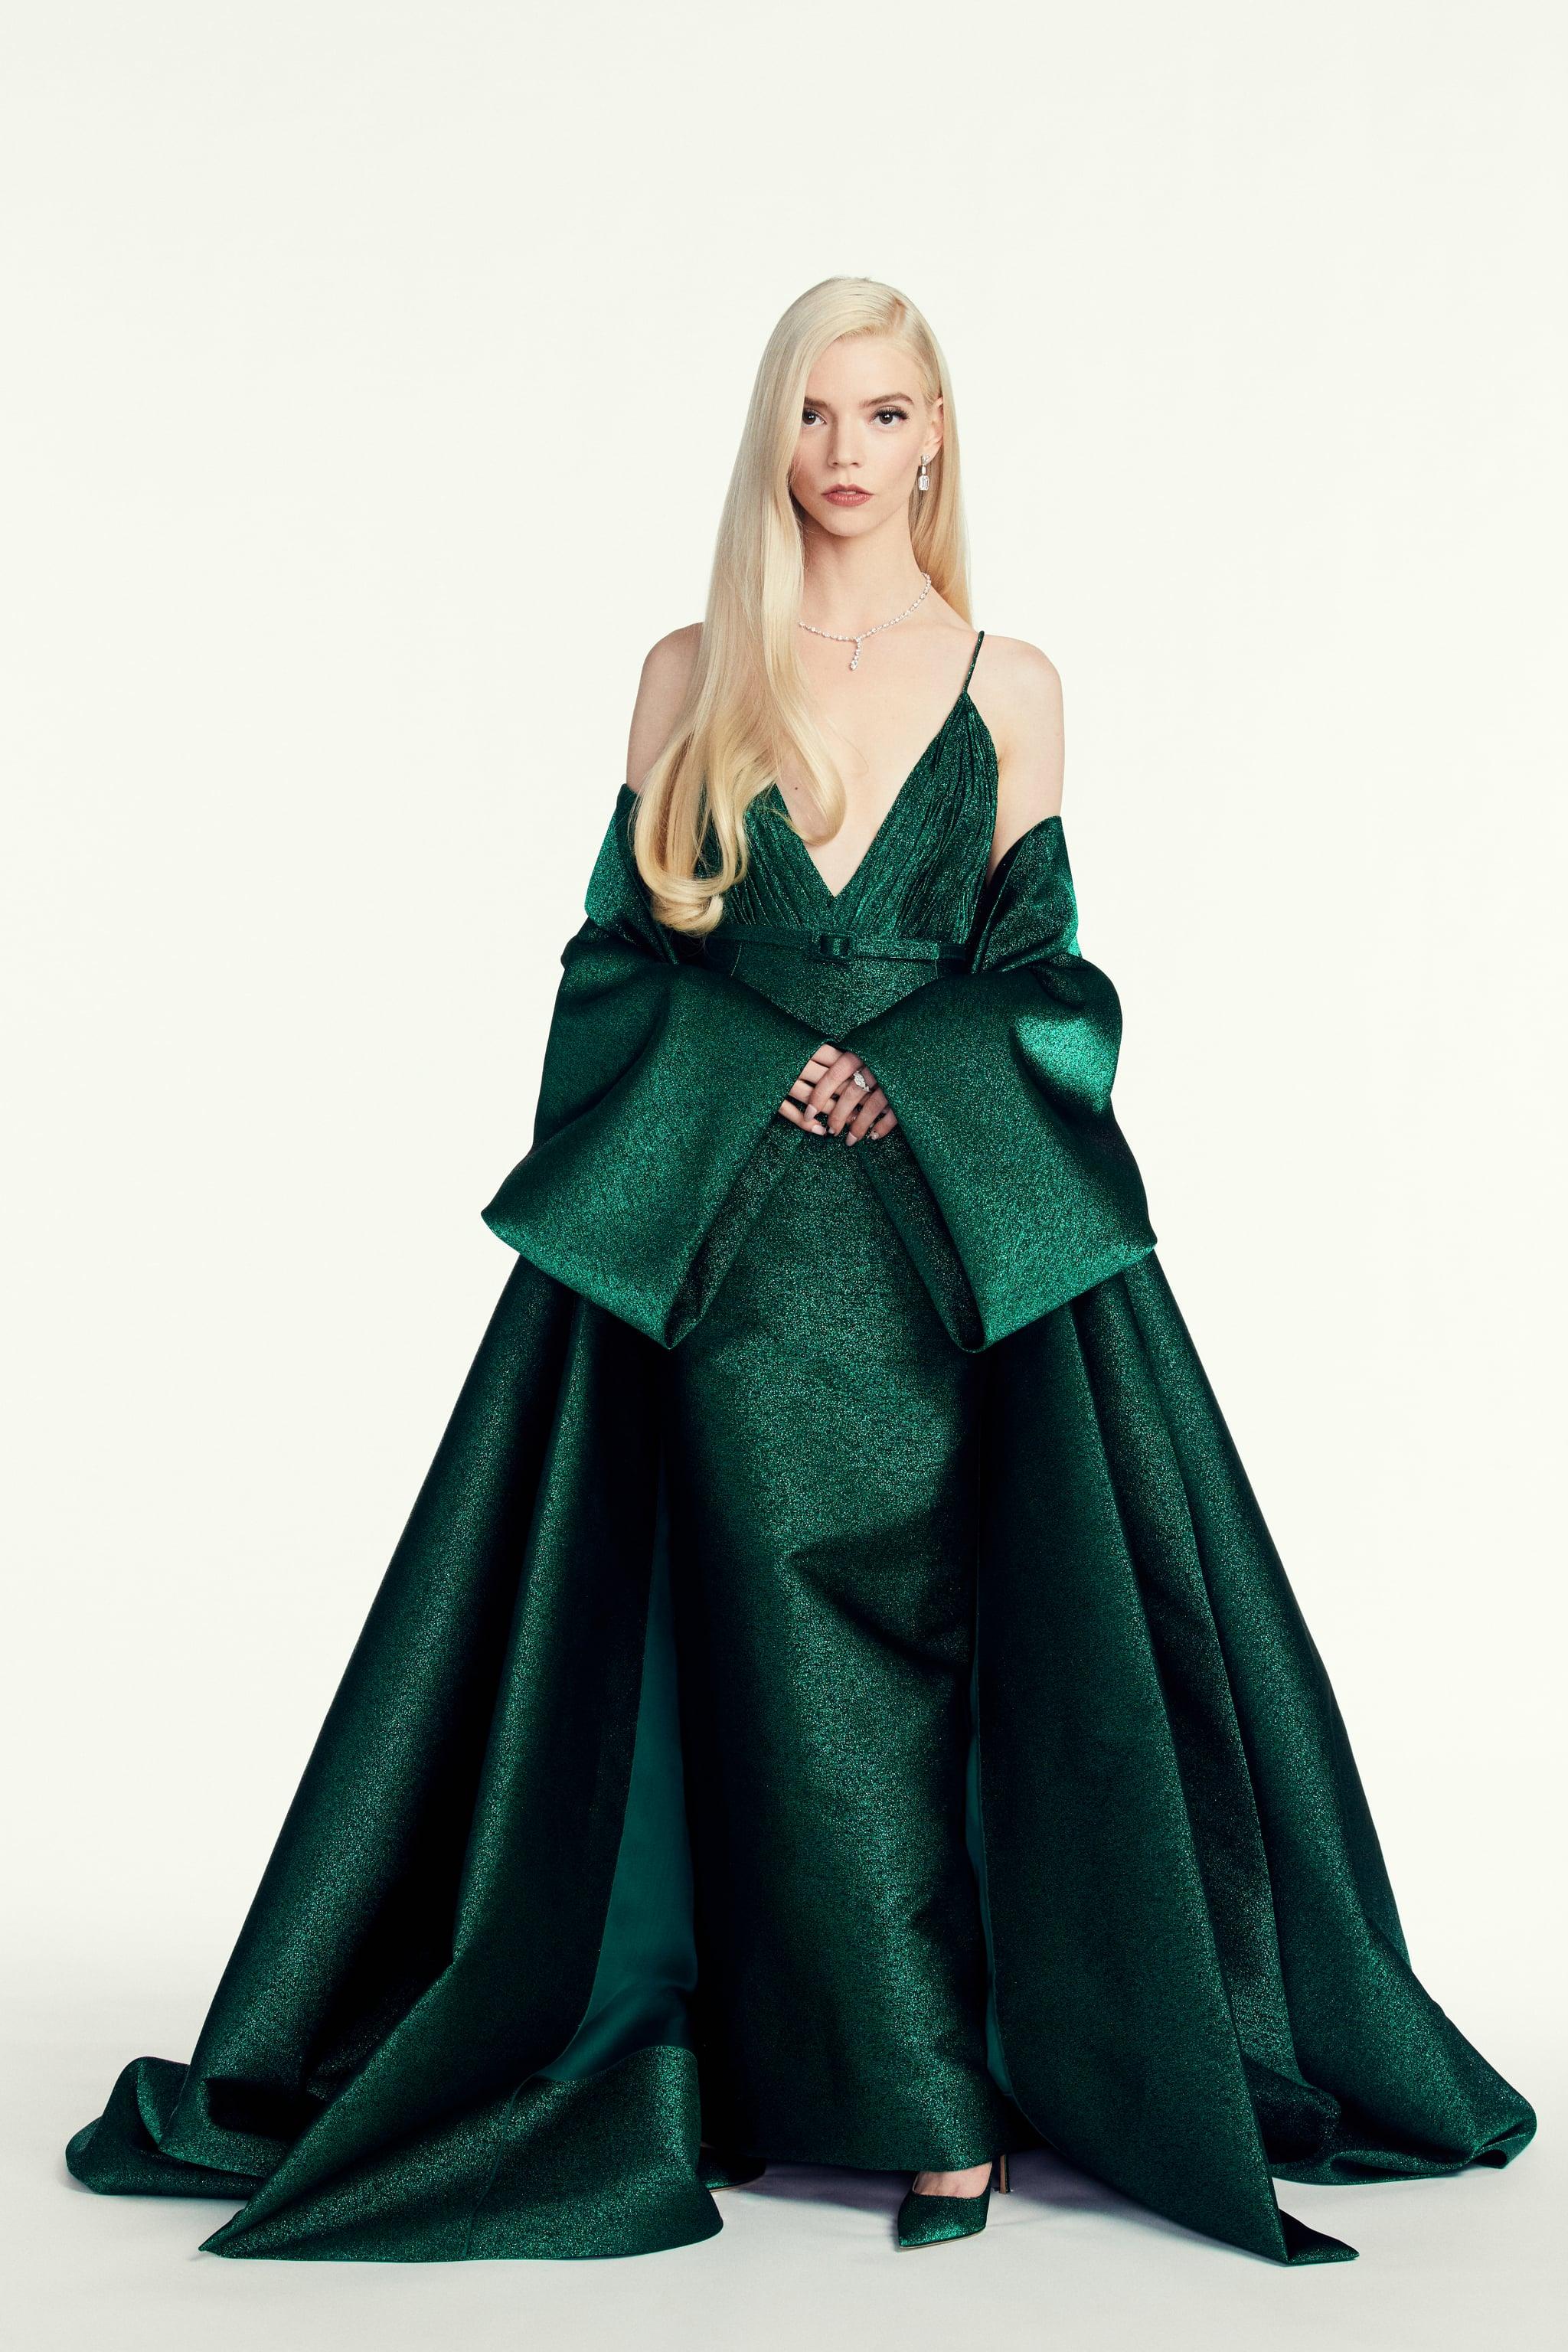 anya-taylor-joy-green-dress-golden-globes-2021